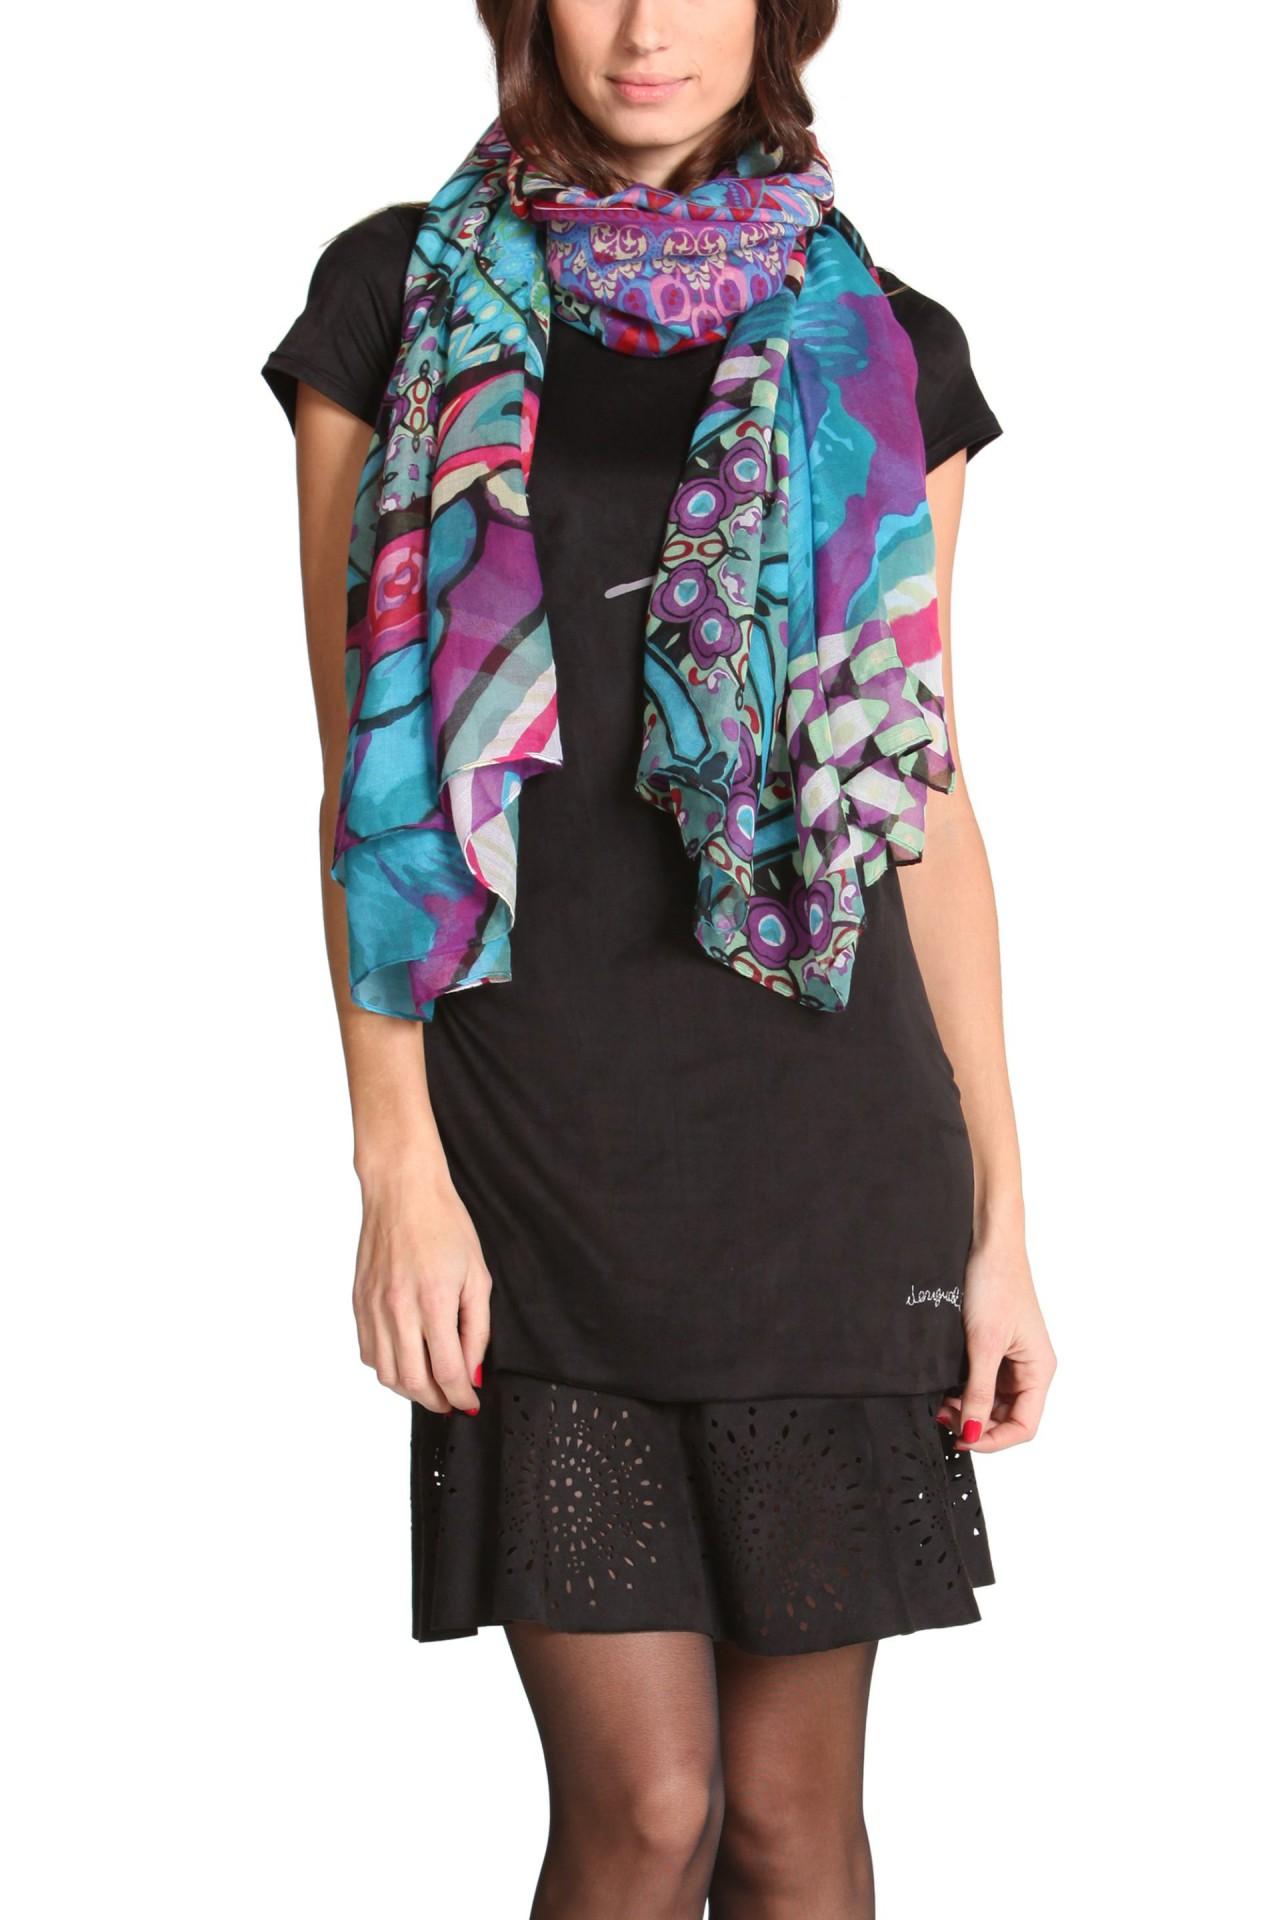 desigual foulard estambul schal tuch halstuch parero damen bunt mehrfarbig neu ebay. Black Bedroom Furniture Sets. Home Design Ideas